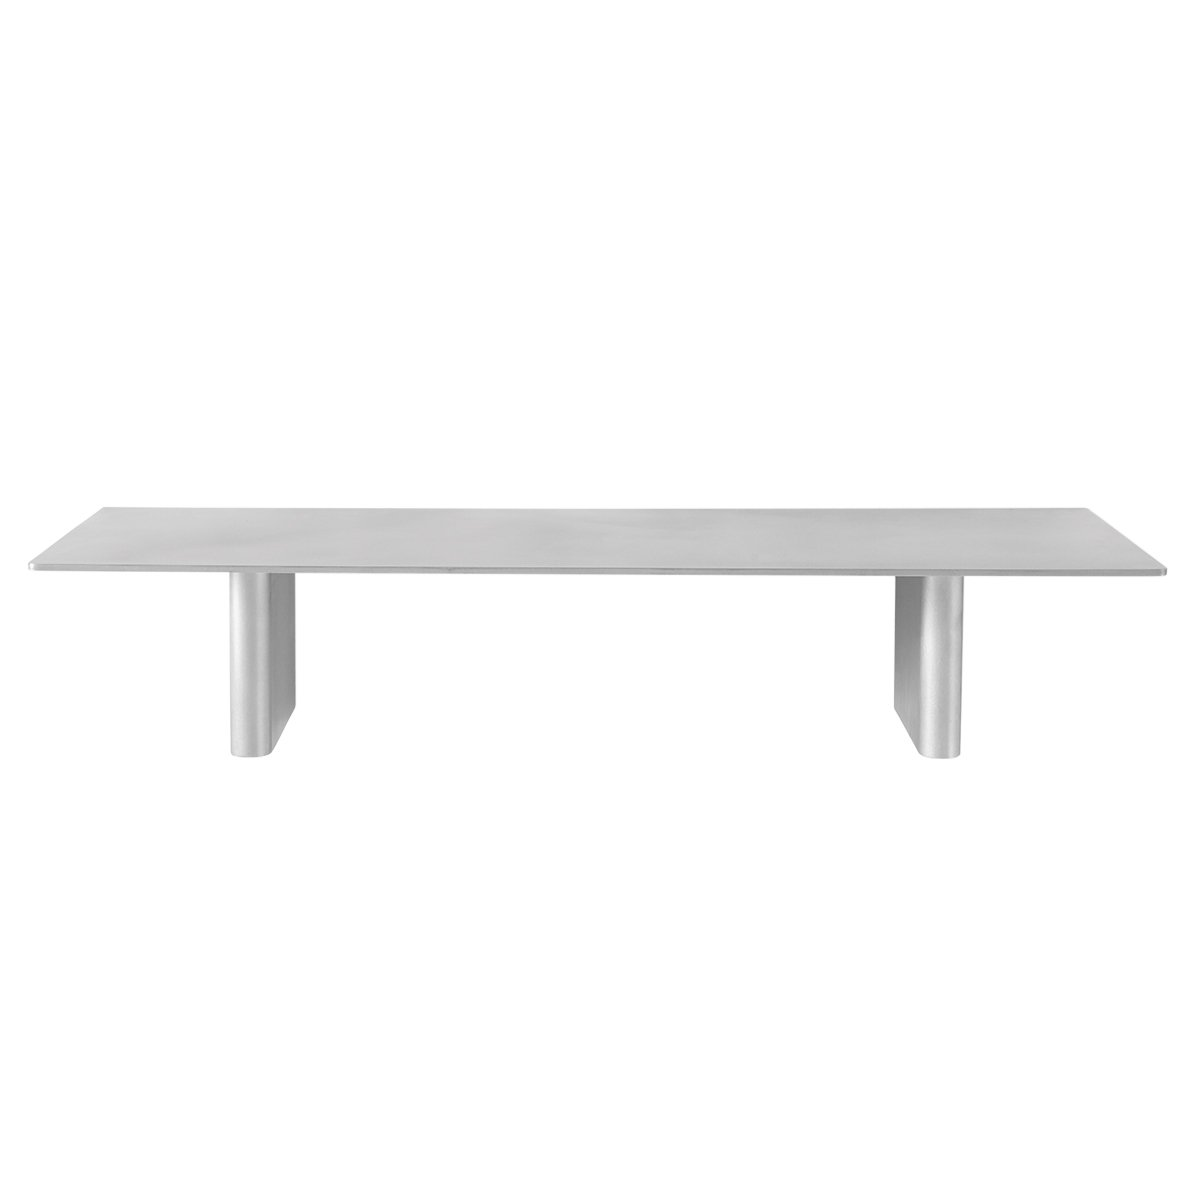 &tradition Column Wandplank - Aluminium 80 x 25 cm.